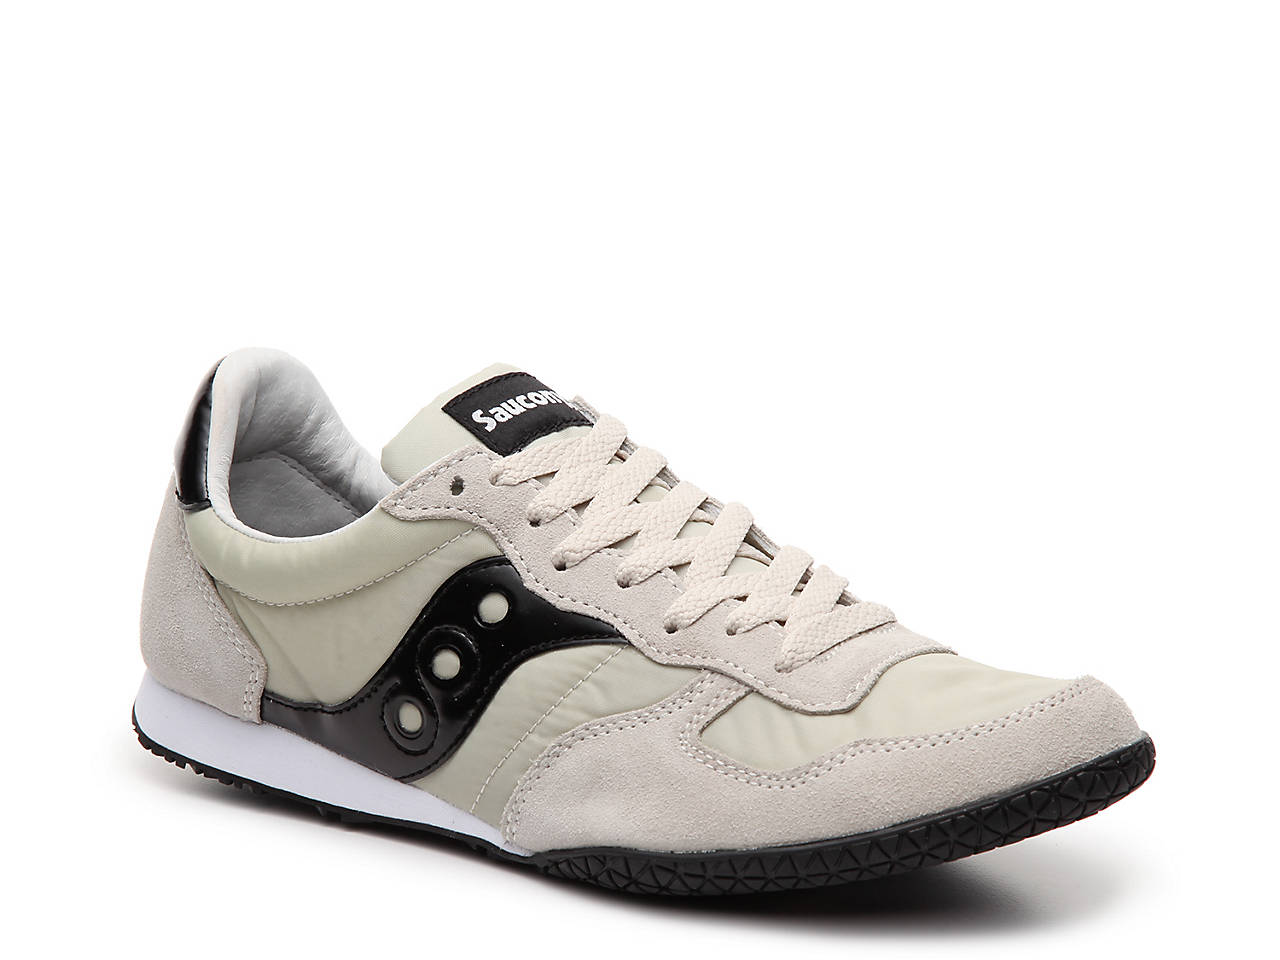 d9083effa059 Saucony Bullet Retro Sneaker - Men s Men s Shoes